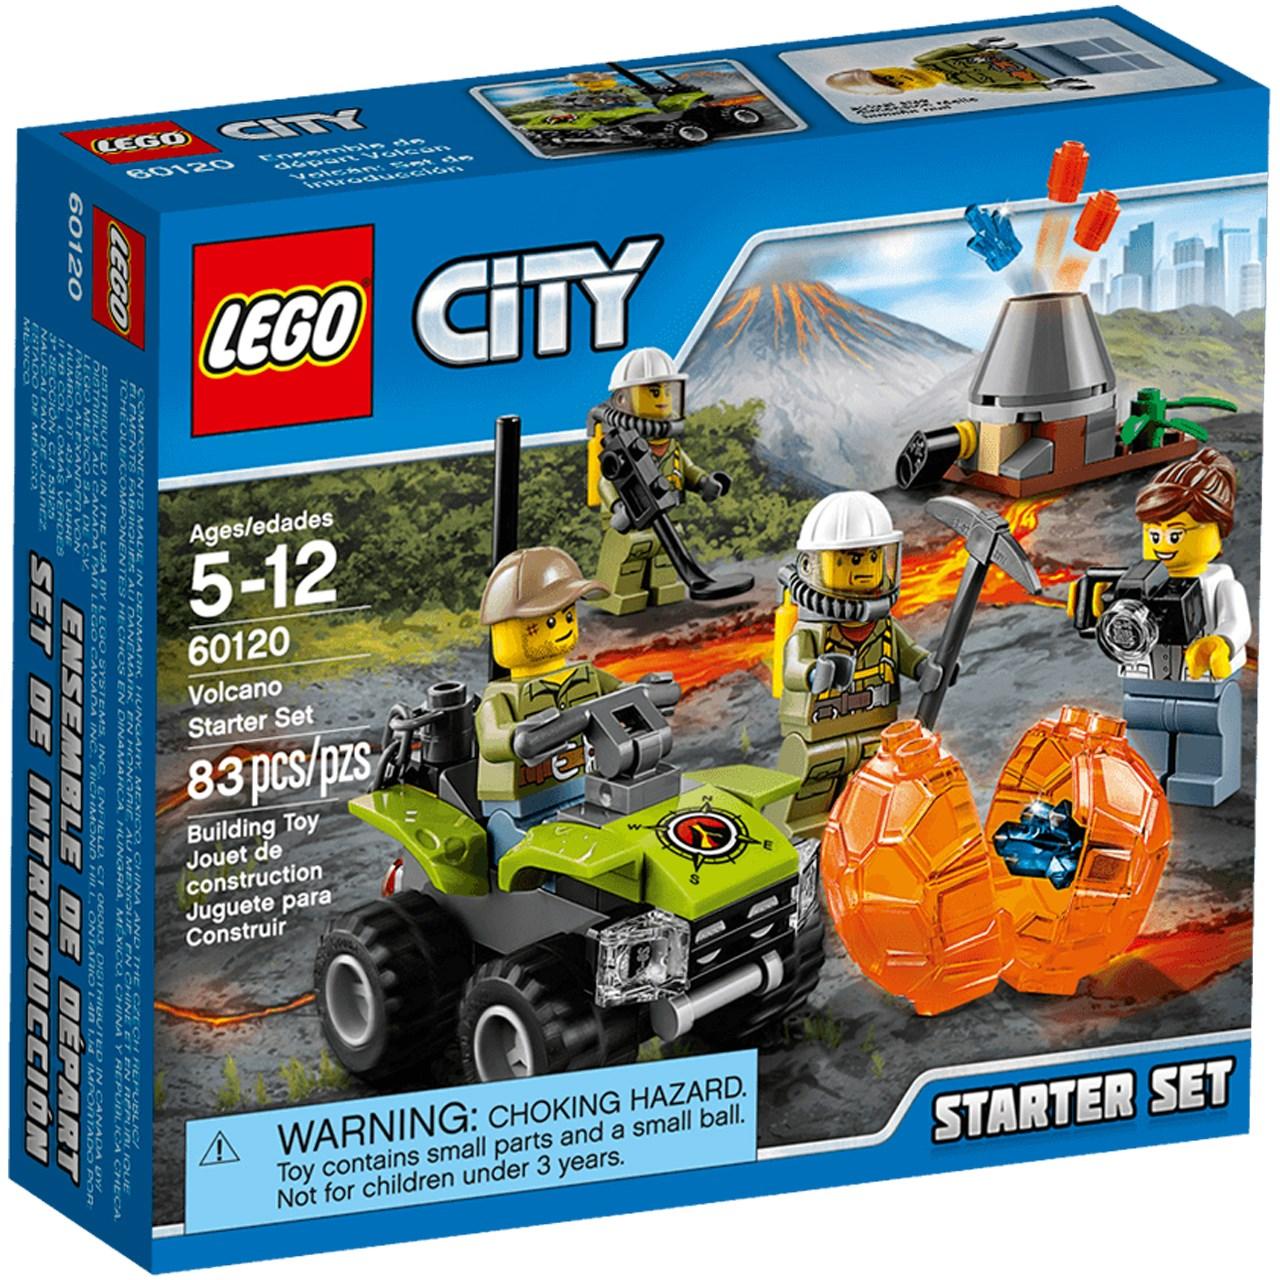 لگو سری City مدل Volcano Starter Set 60120